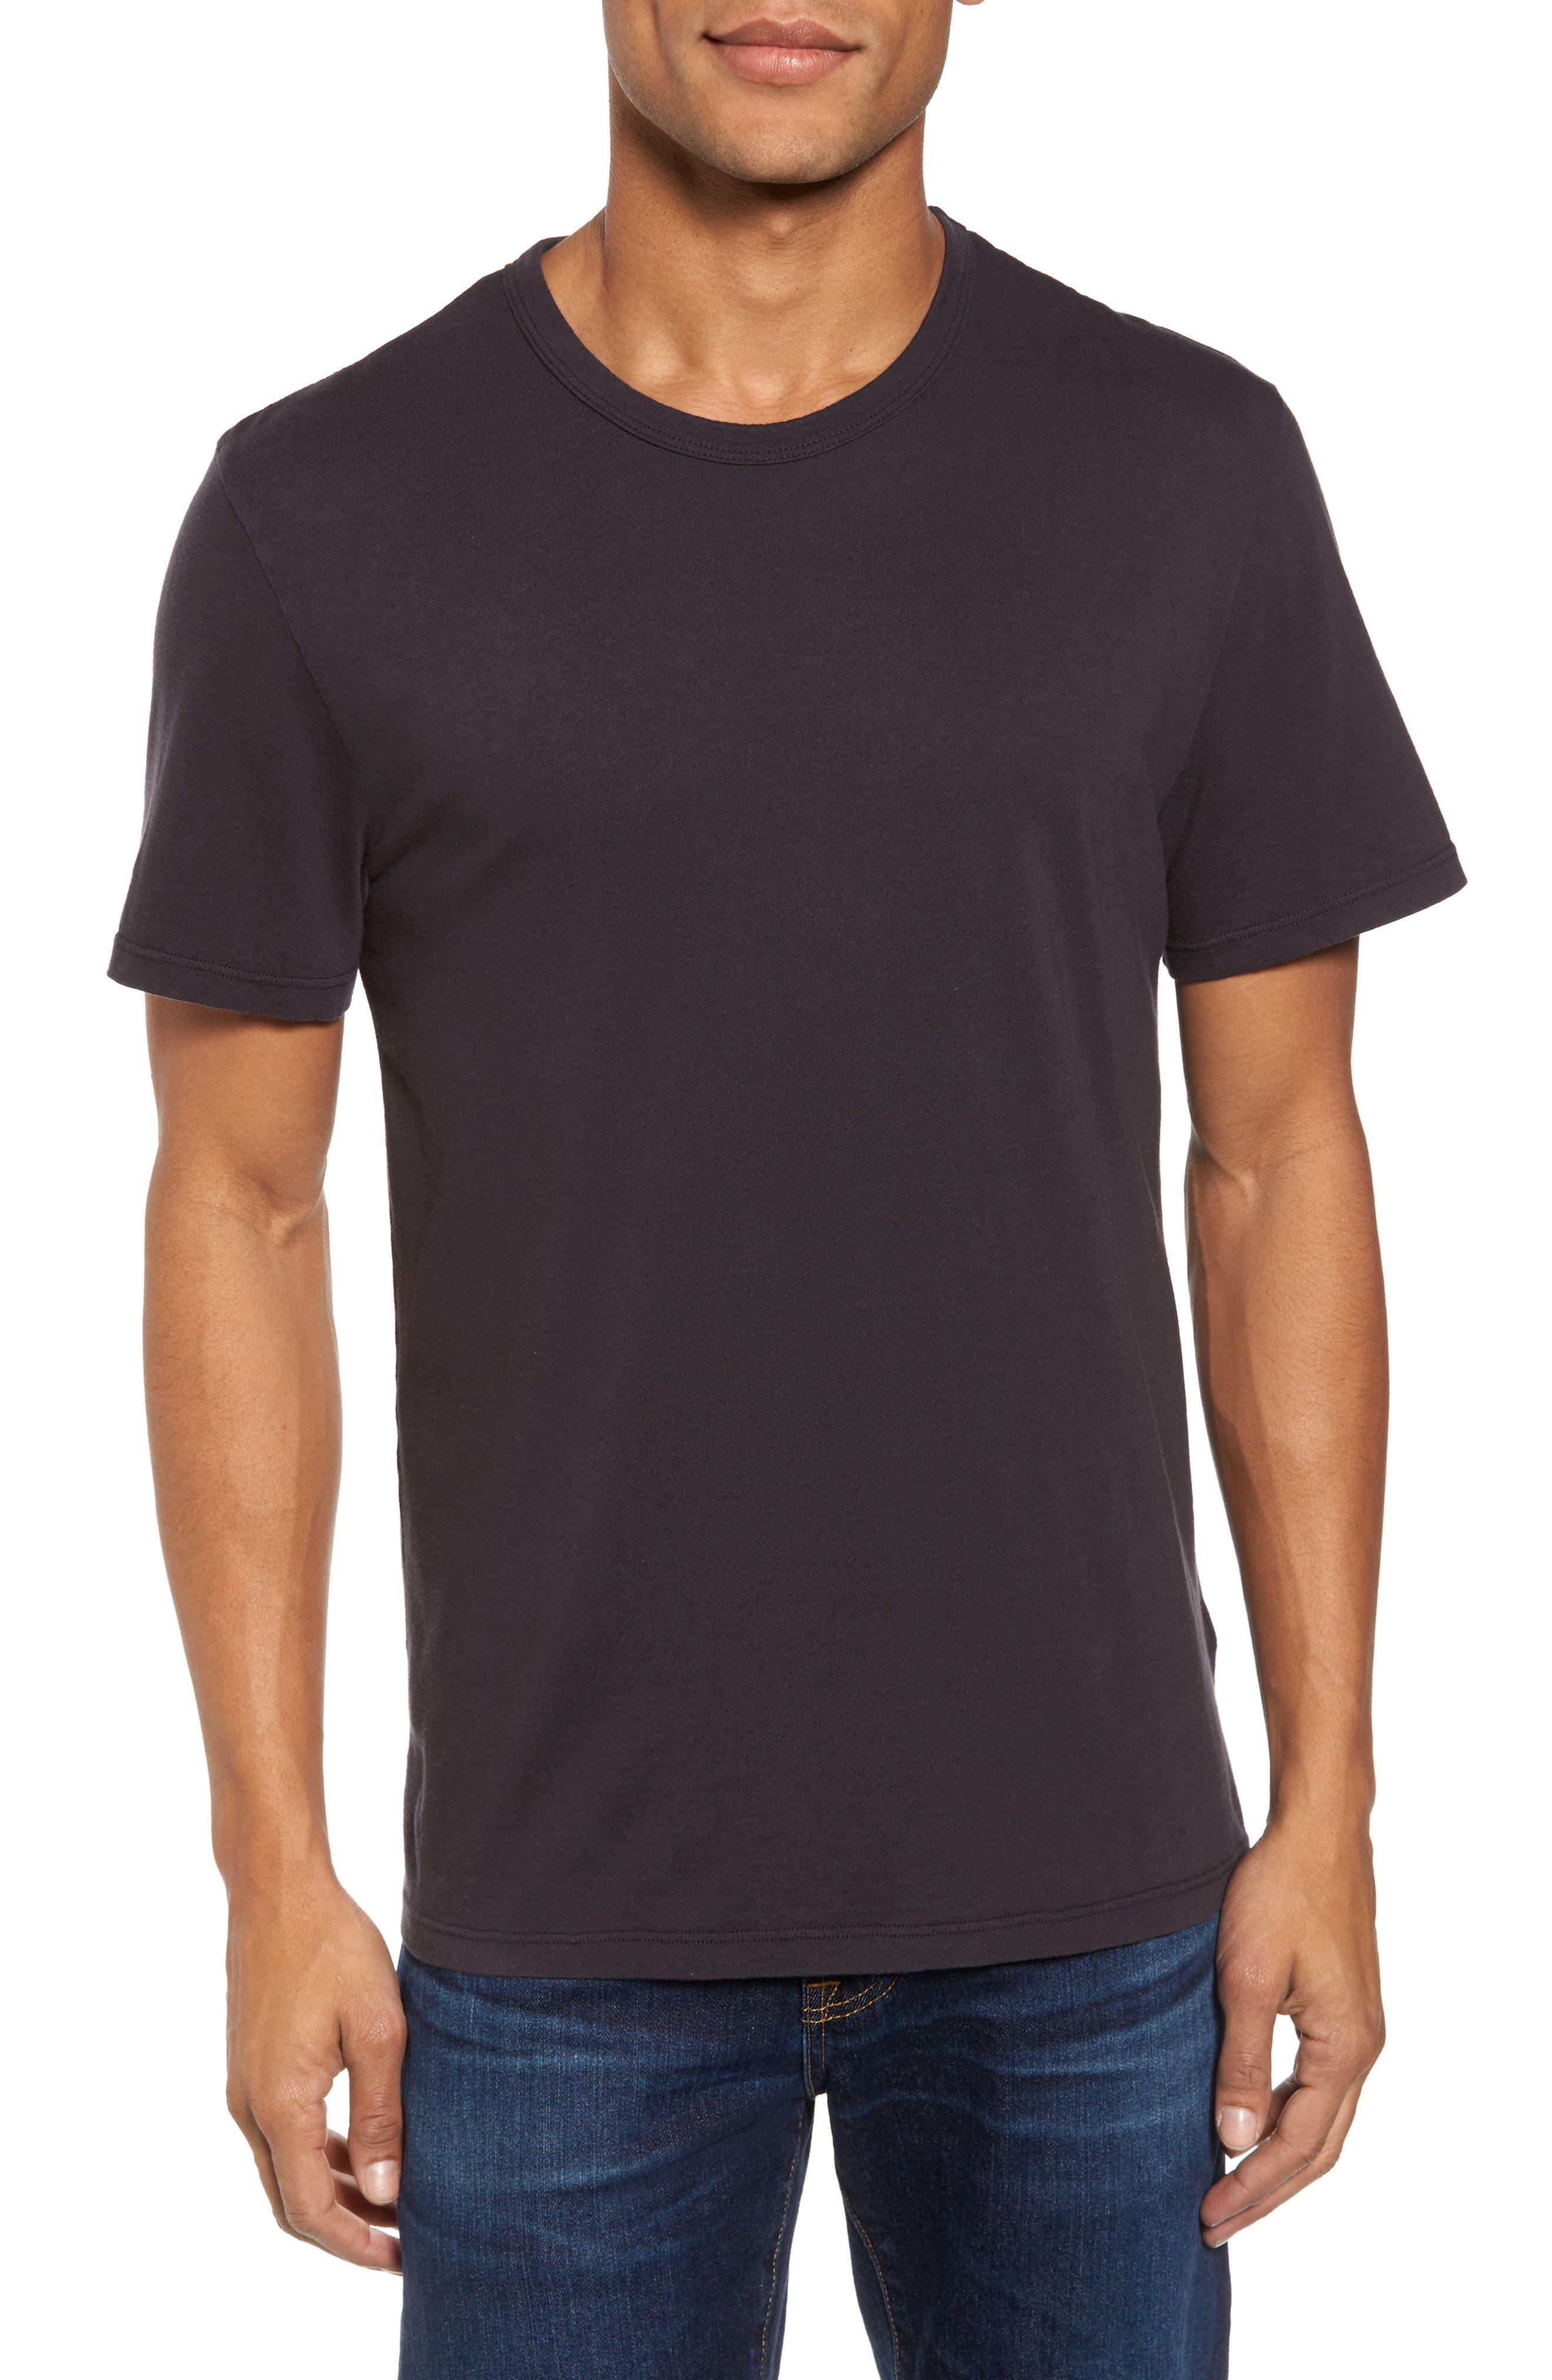 Suvin Crewneck T-Shirt,                             Main thumbnail 1, color,                             Squid